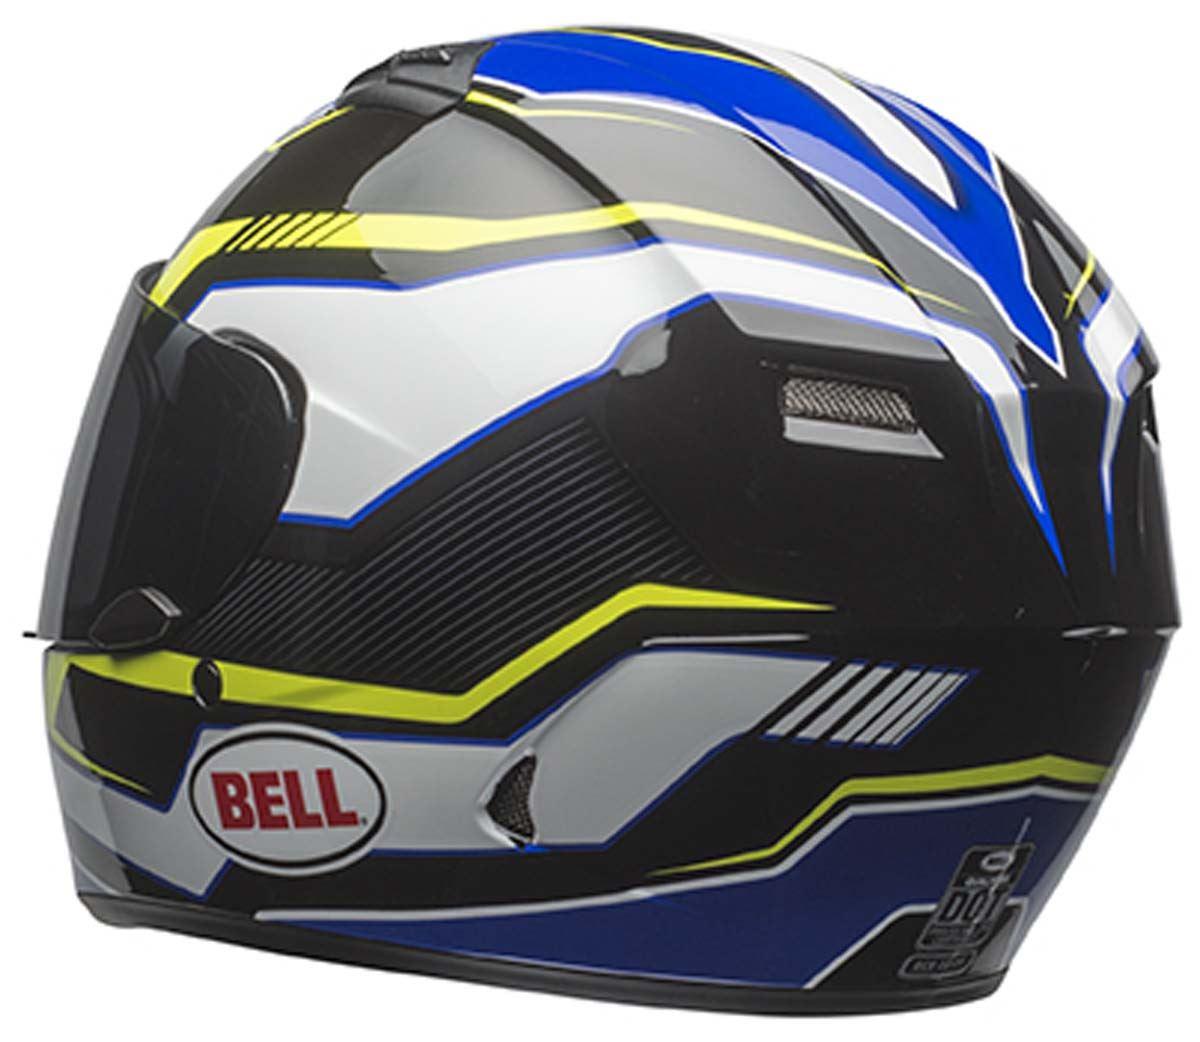 Bell-Qualifier-Helmet-Full-Face-Motorcycle-Clear-Shield-DOT-XS-3XL miniature 27